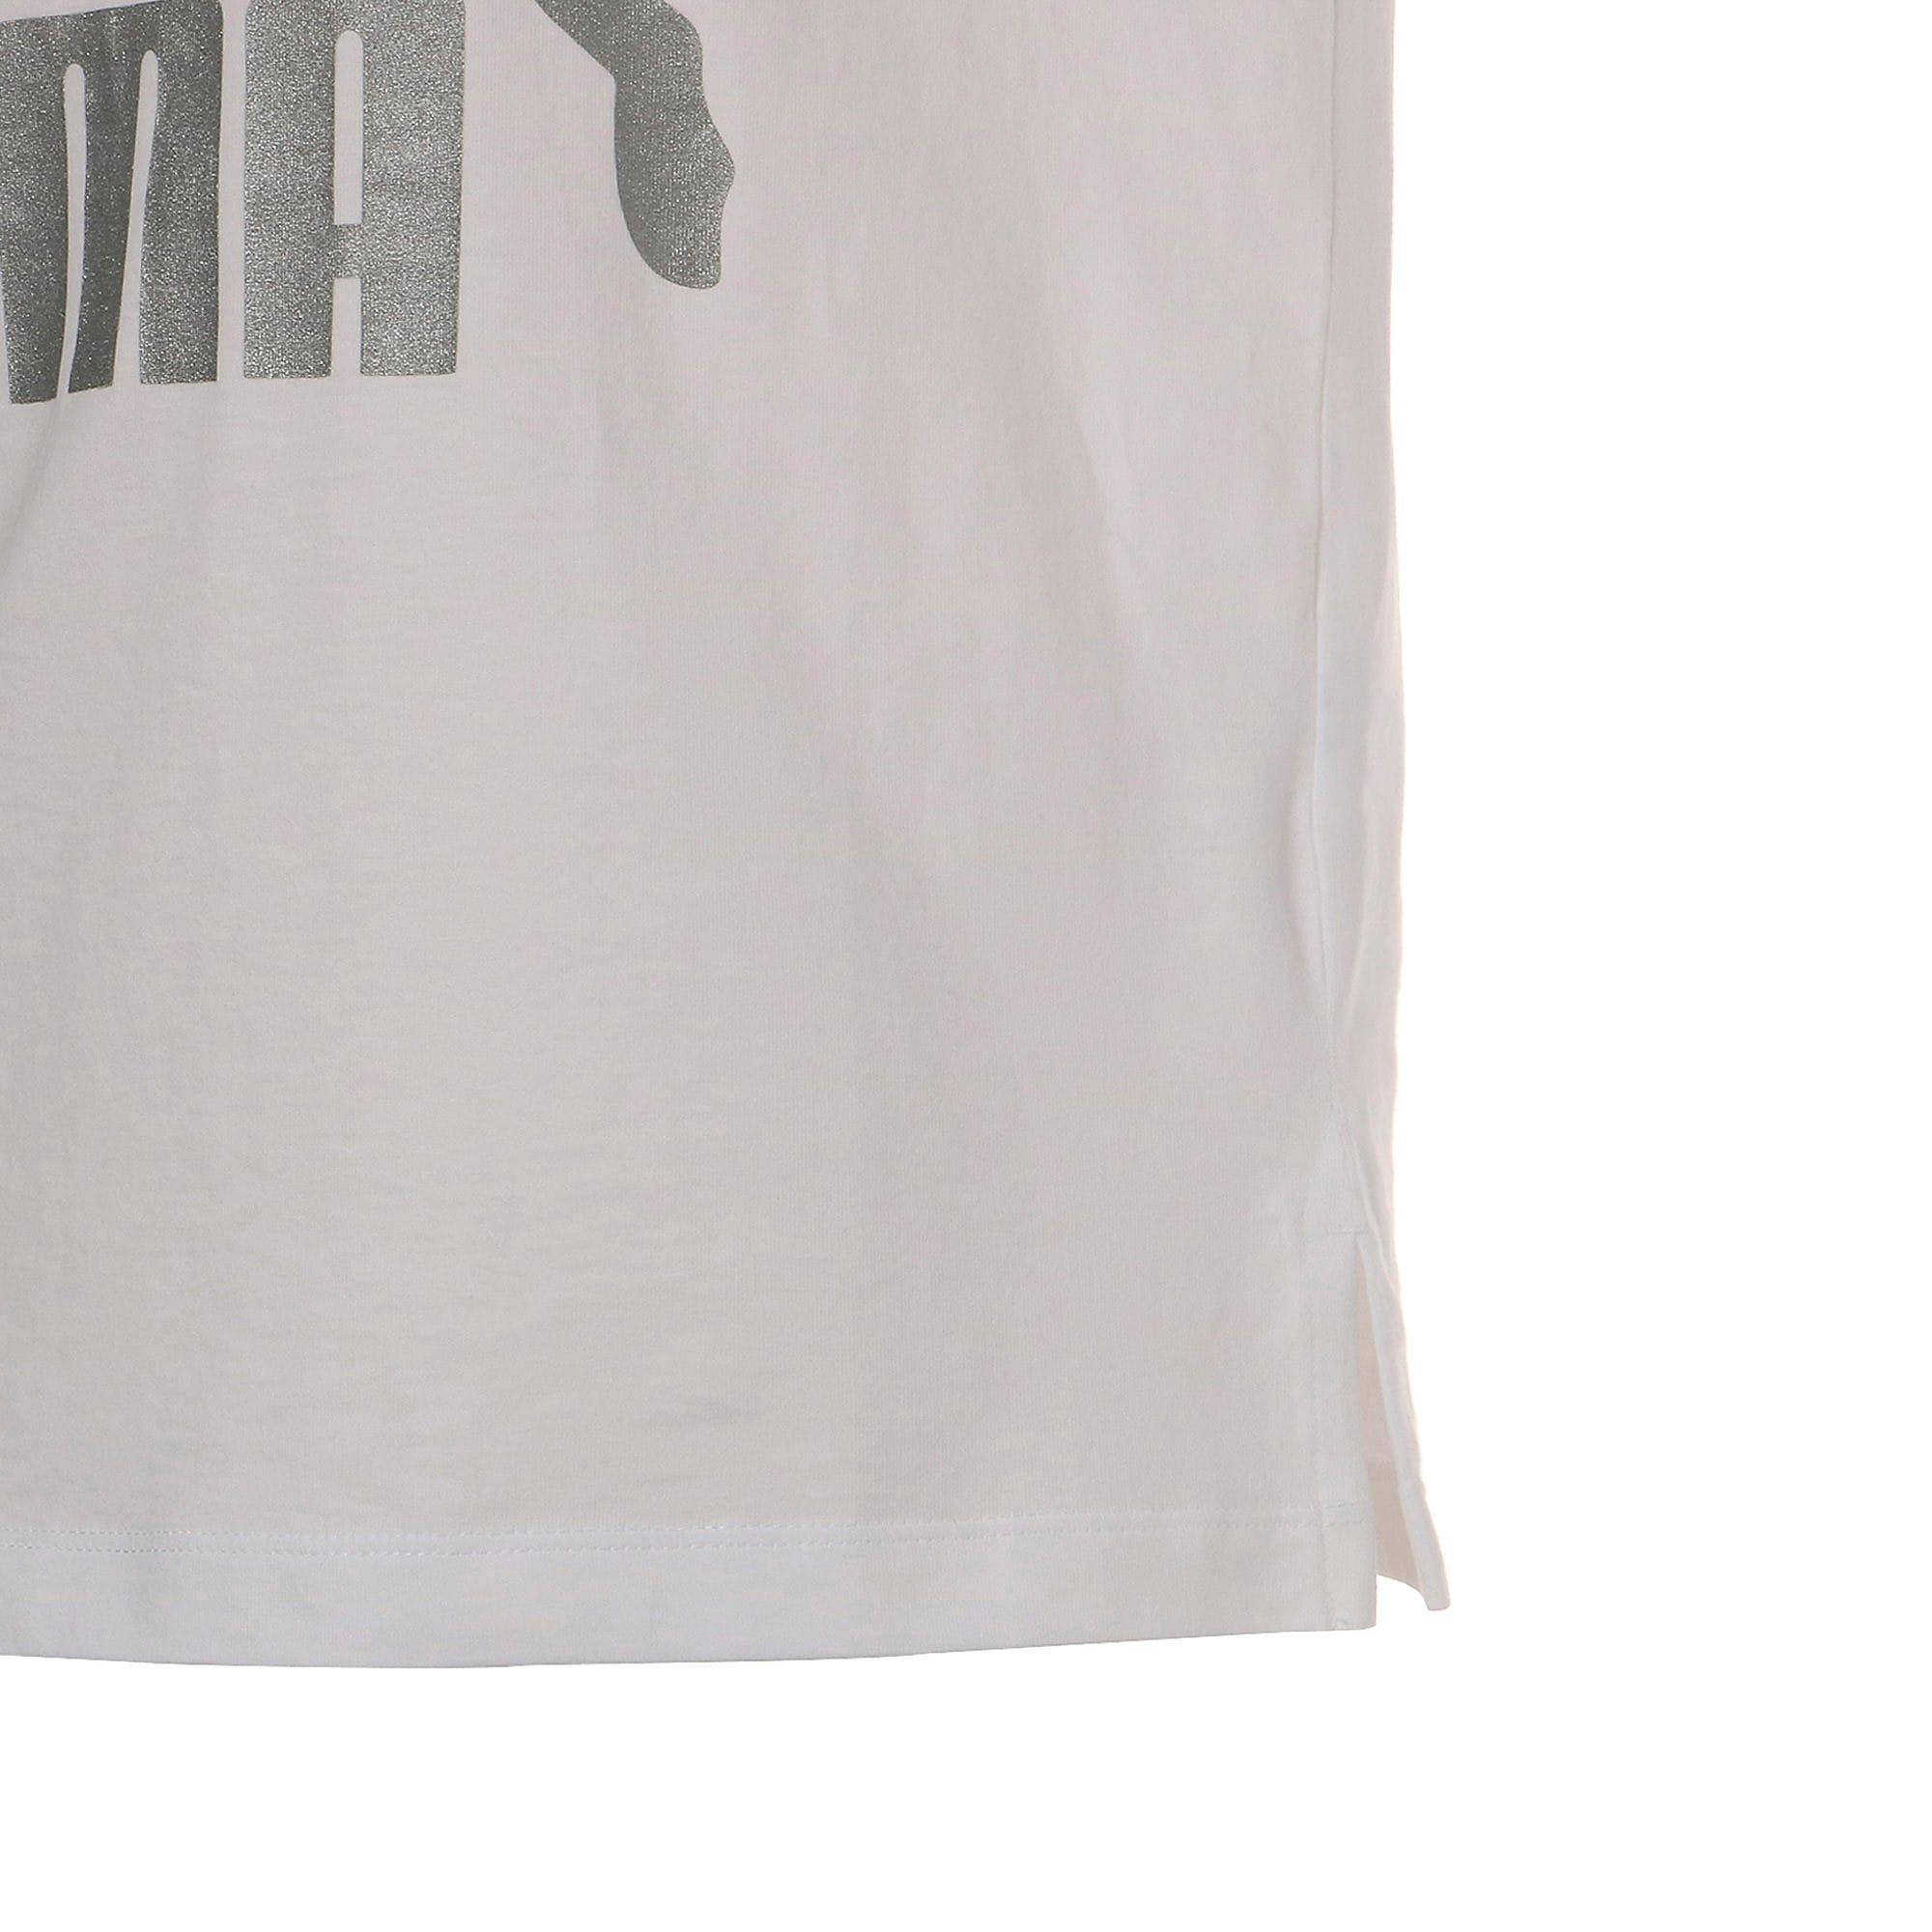 Thumbnail 8 of CLASSICS ロゴ ウィメンズ SS Tシャツ 半袖, Puma White-metal, medium-JPN